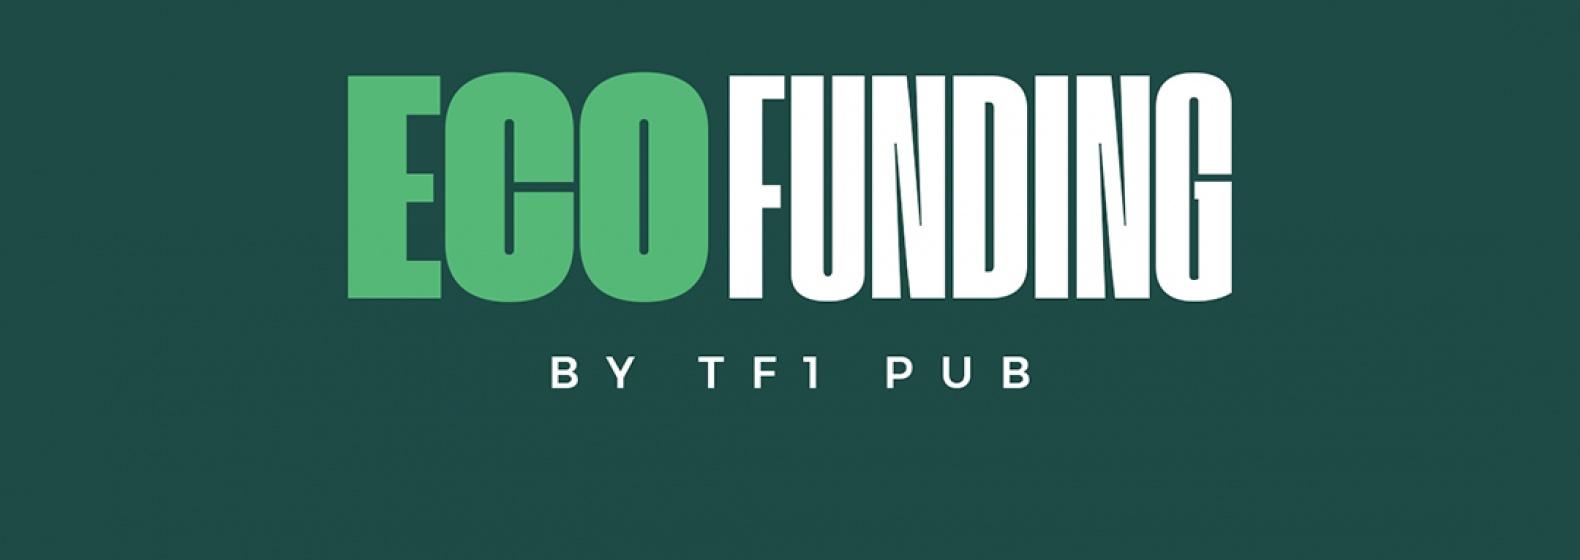 ecofunding3.jpg